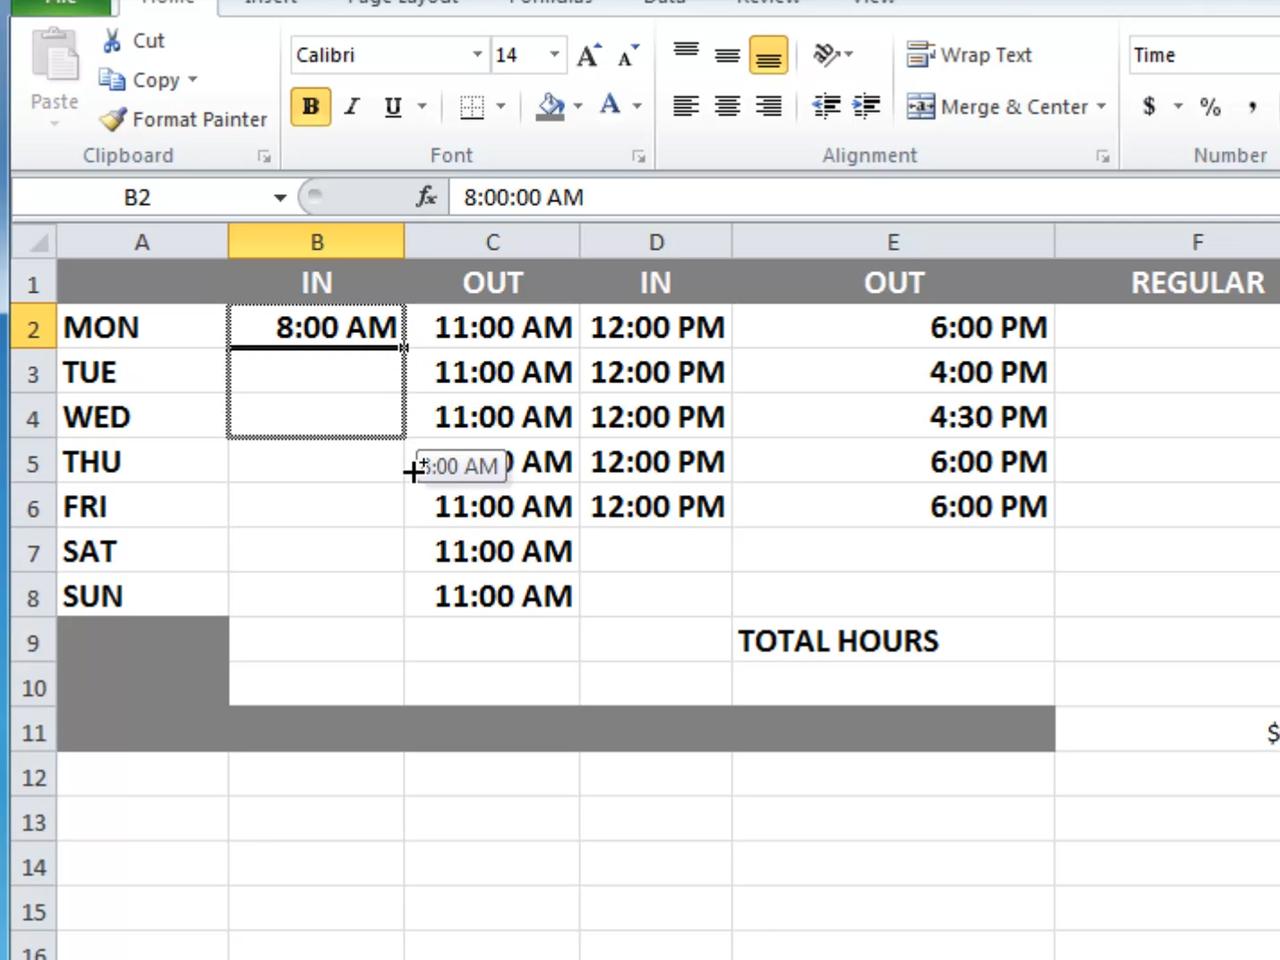 Access Count Days Excluding Weekends Uptoken Qiniu 74